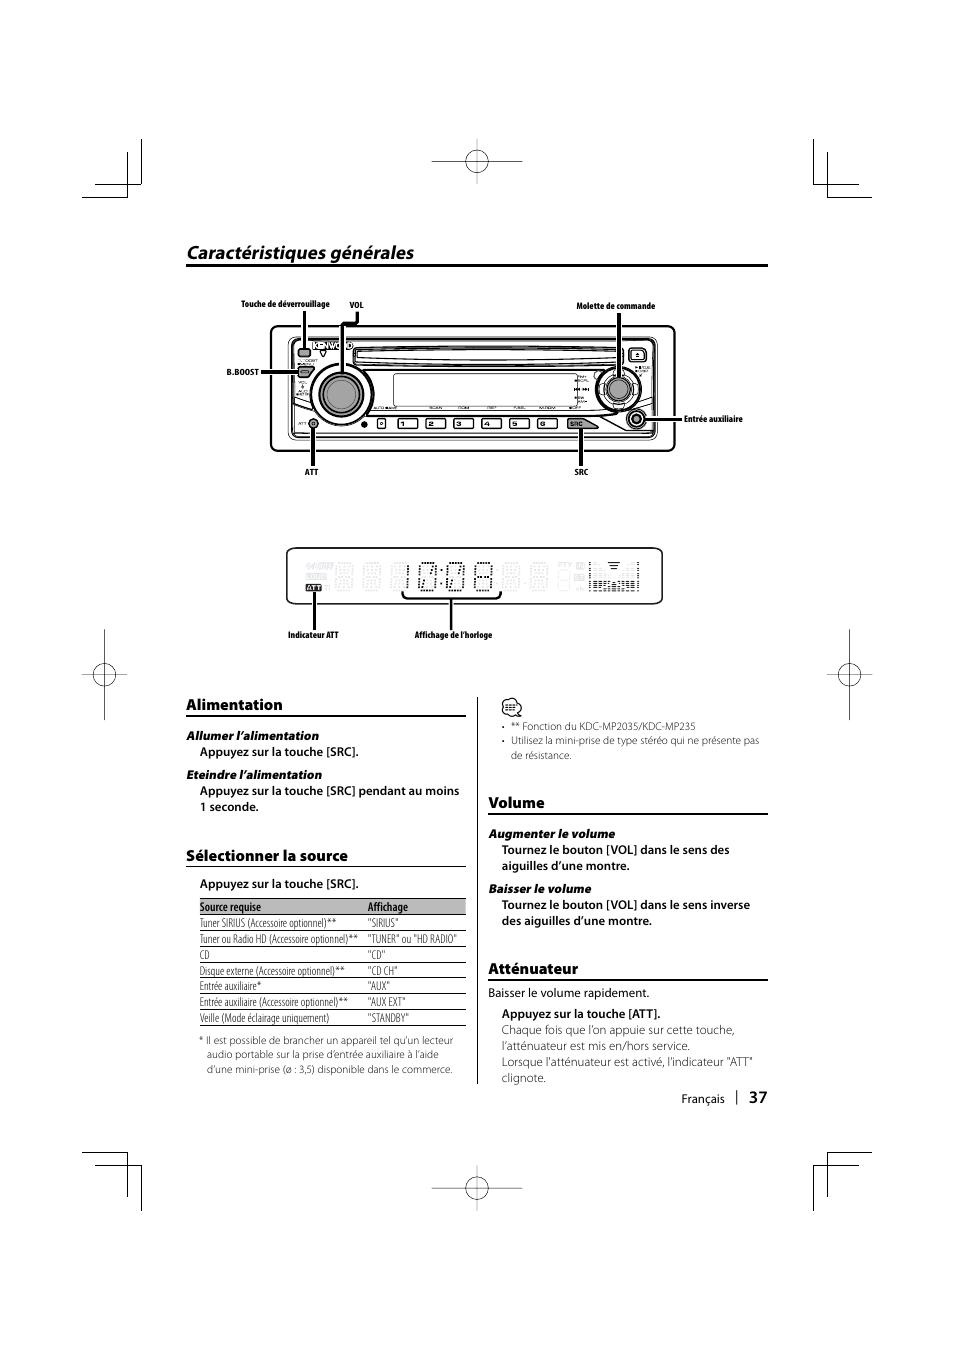 Kenwood kdc-mp2035 kdc-mp205 kdc-mp235 kdc-mp235cr service manual.